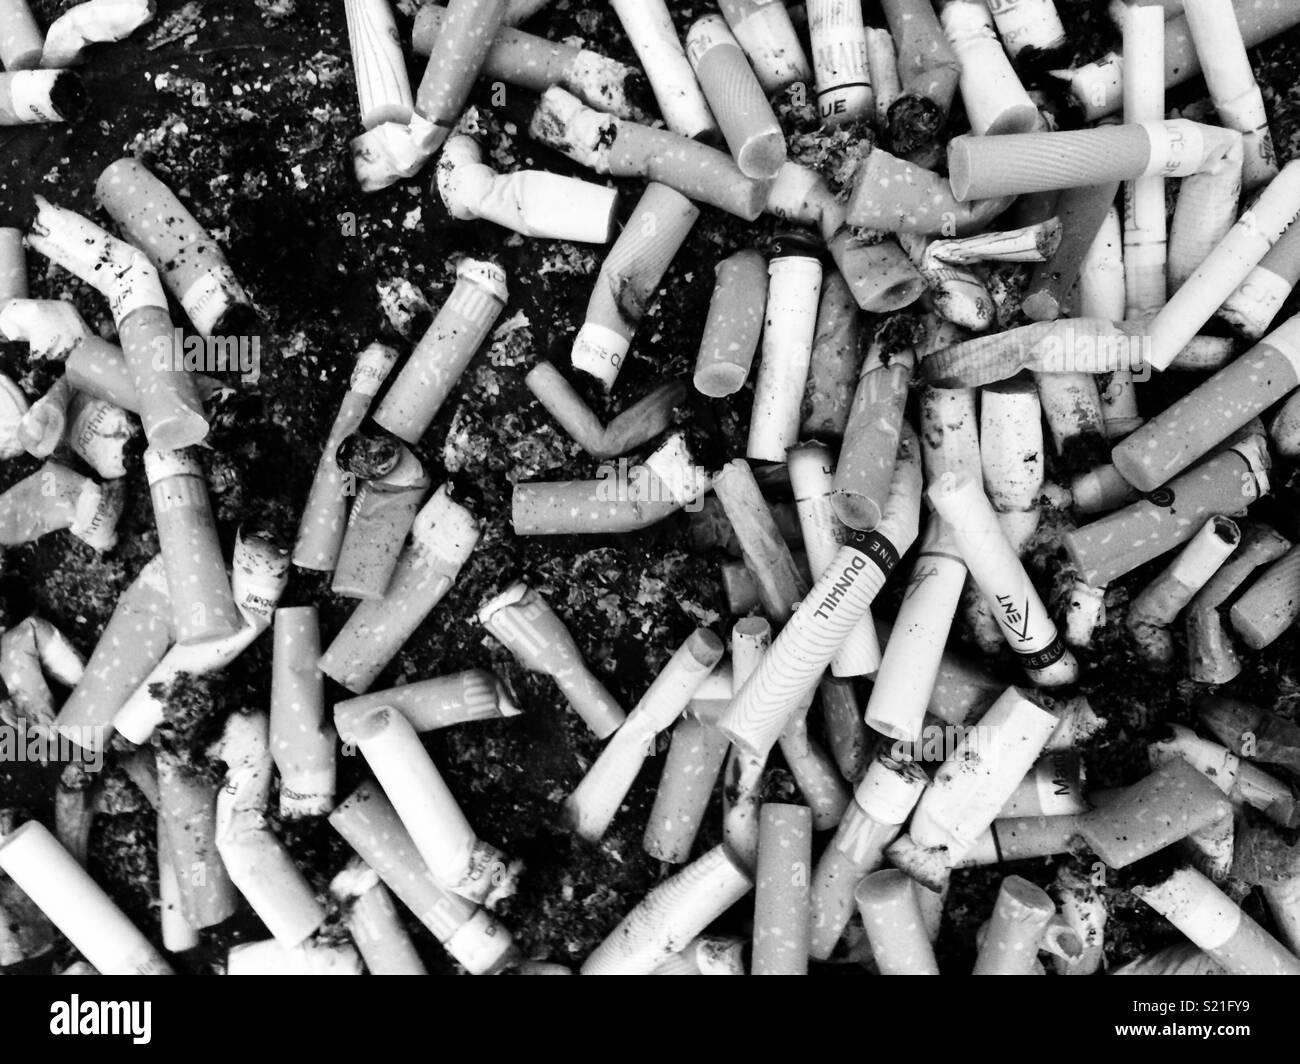 Price of Marlboro cigarettes in France